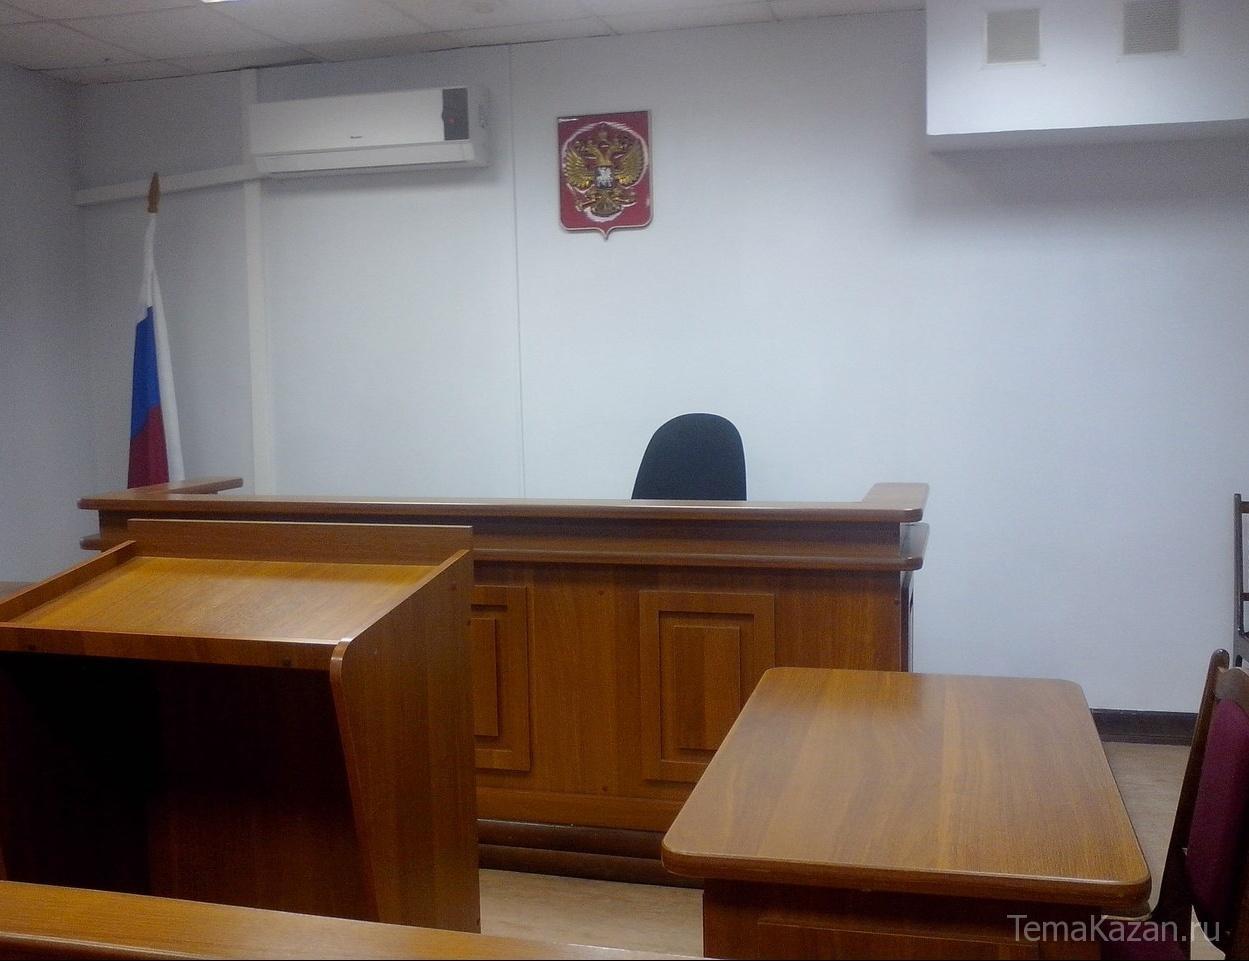 Гражданин Татарстана, который облил сожительницу горючим иподжег, предстанет перед судом